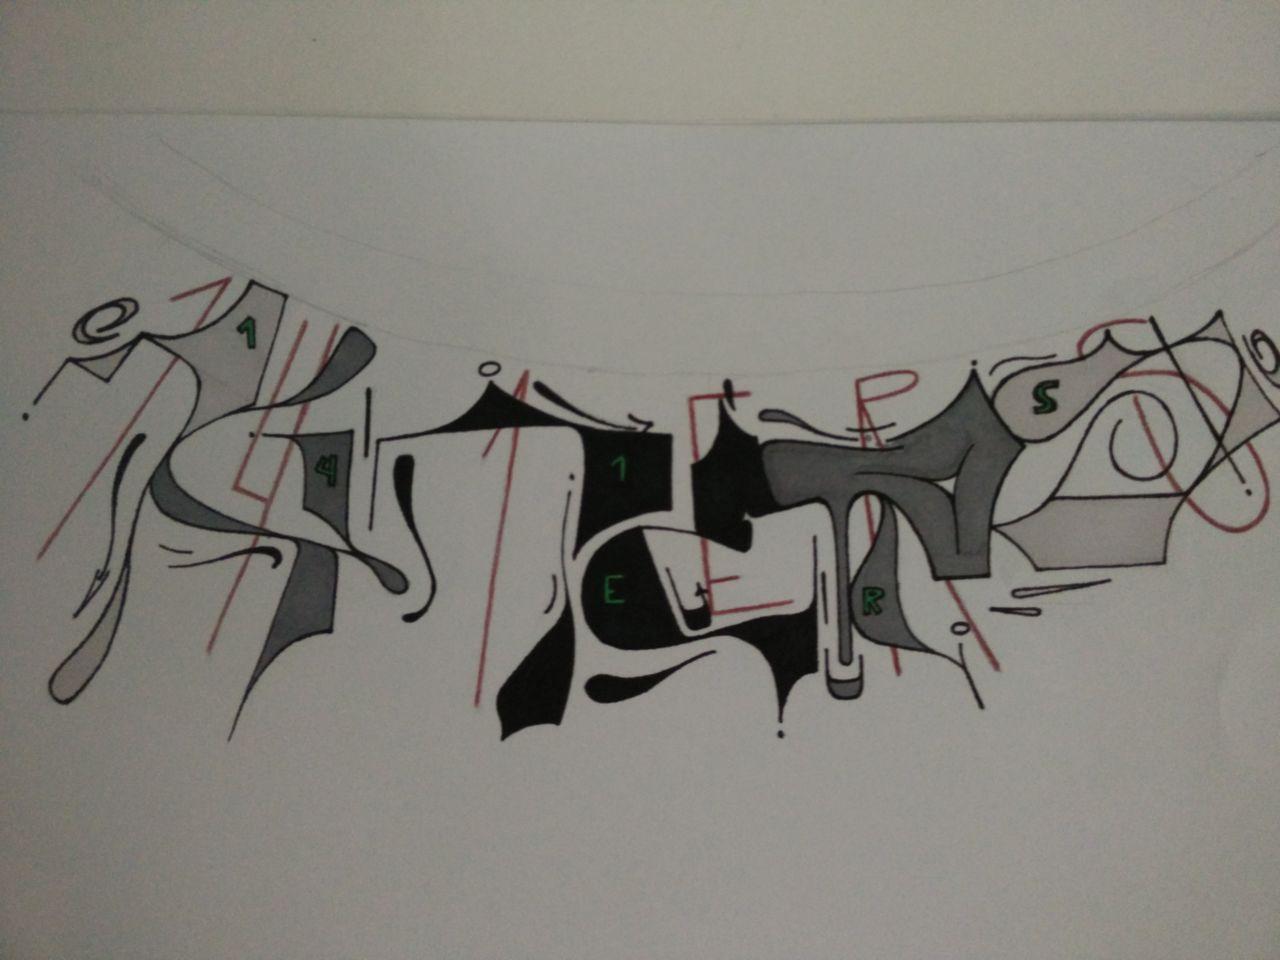 bild 141ers graffiti mischtechnik comic von bivi bei kunstnet. Black Bedroom Furniture Sets. Home Design Ideas